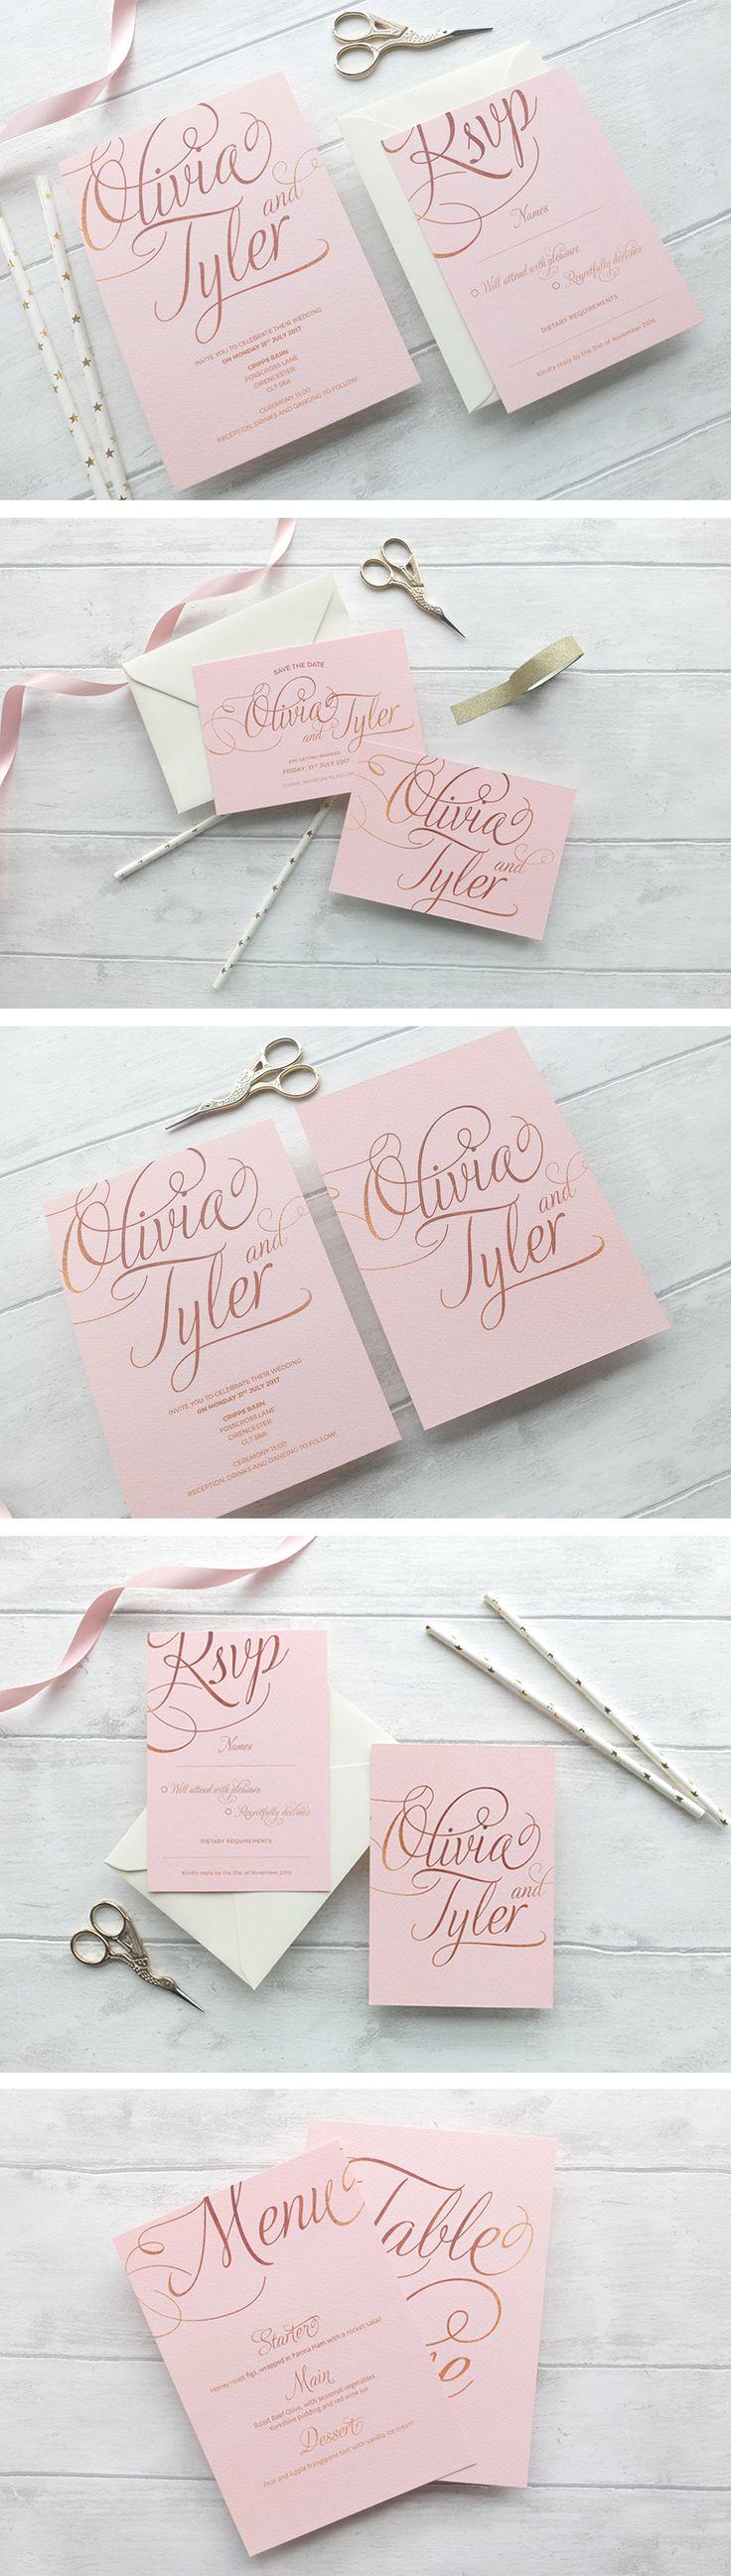 Best 25 Invitation Envelopes Ideas On Pinterest Wedding